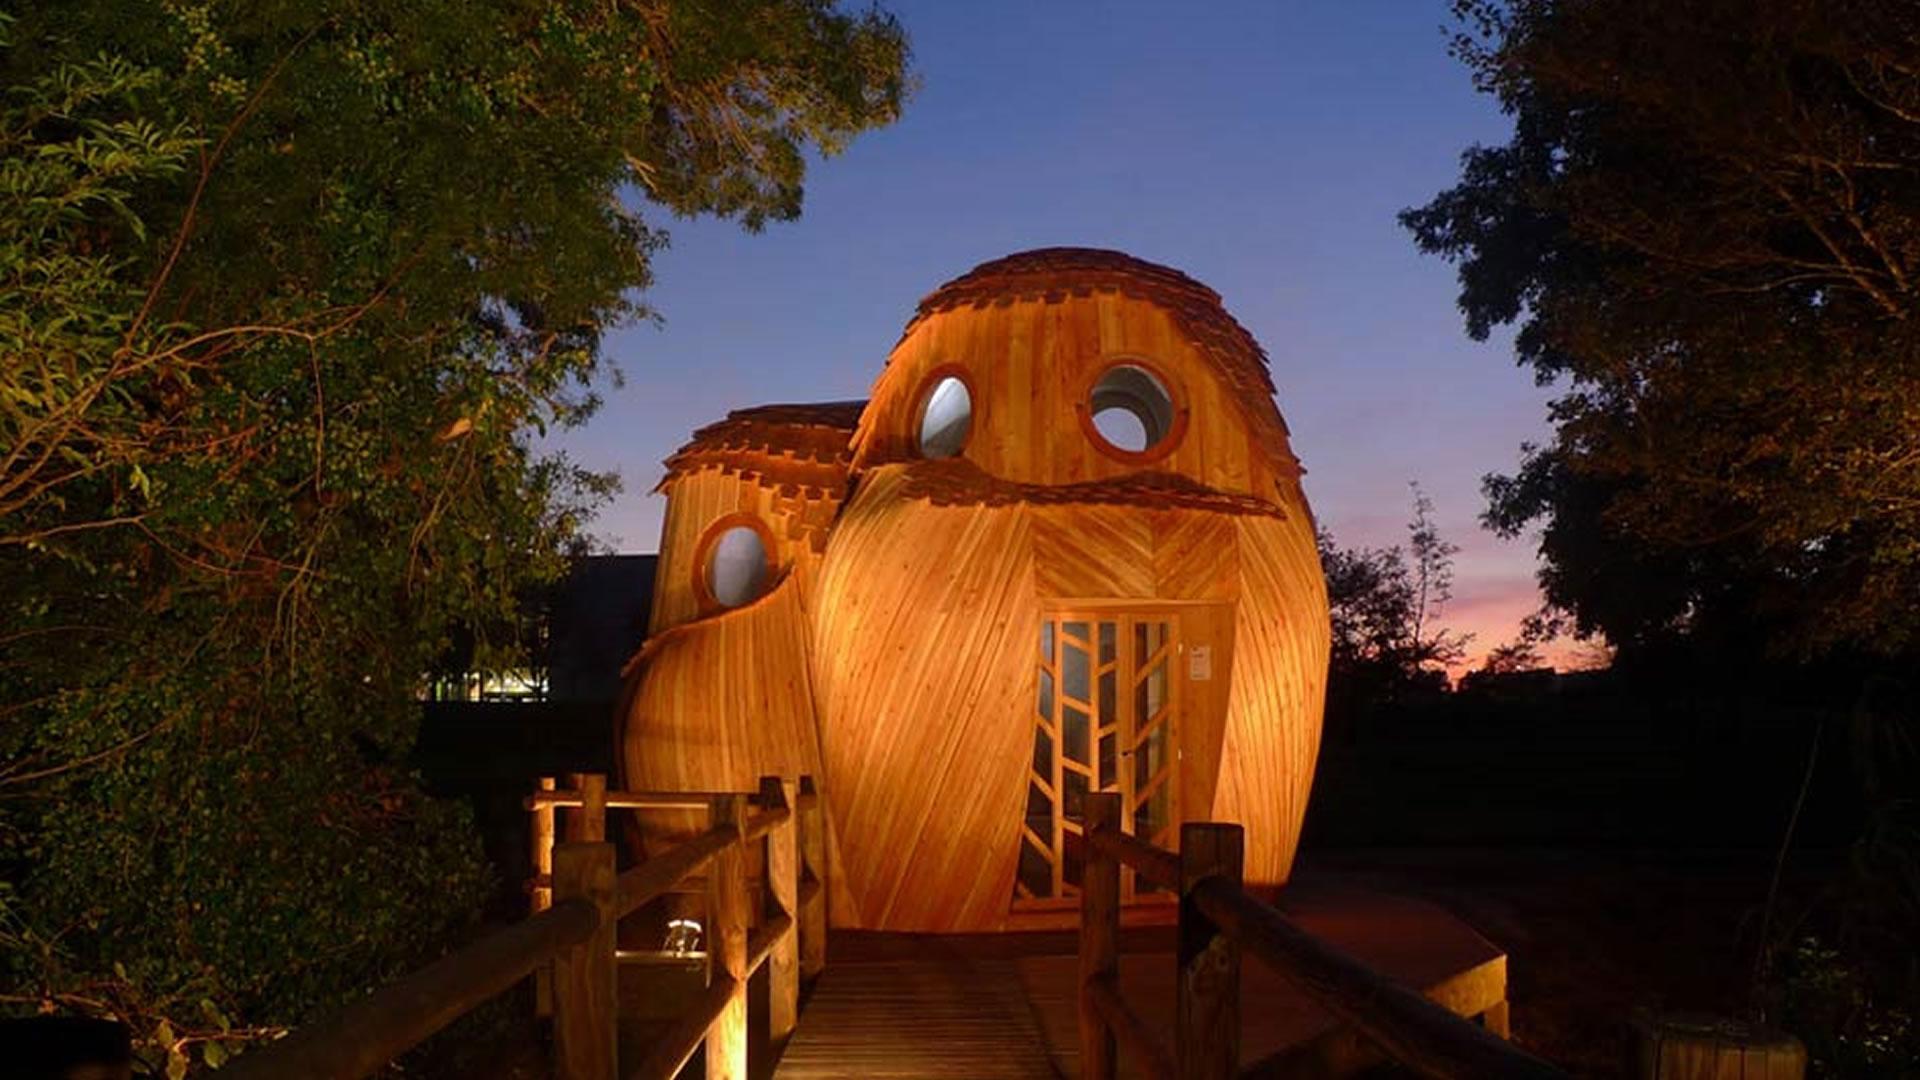 Podemos alojarnos gratis en estas sorprendentes cabinas en forma de búho en Francia